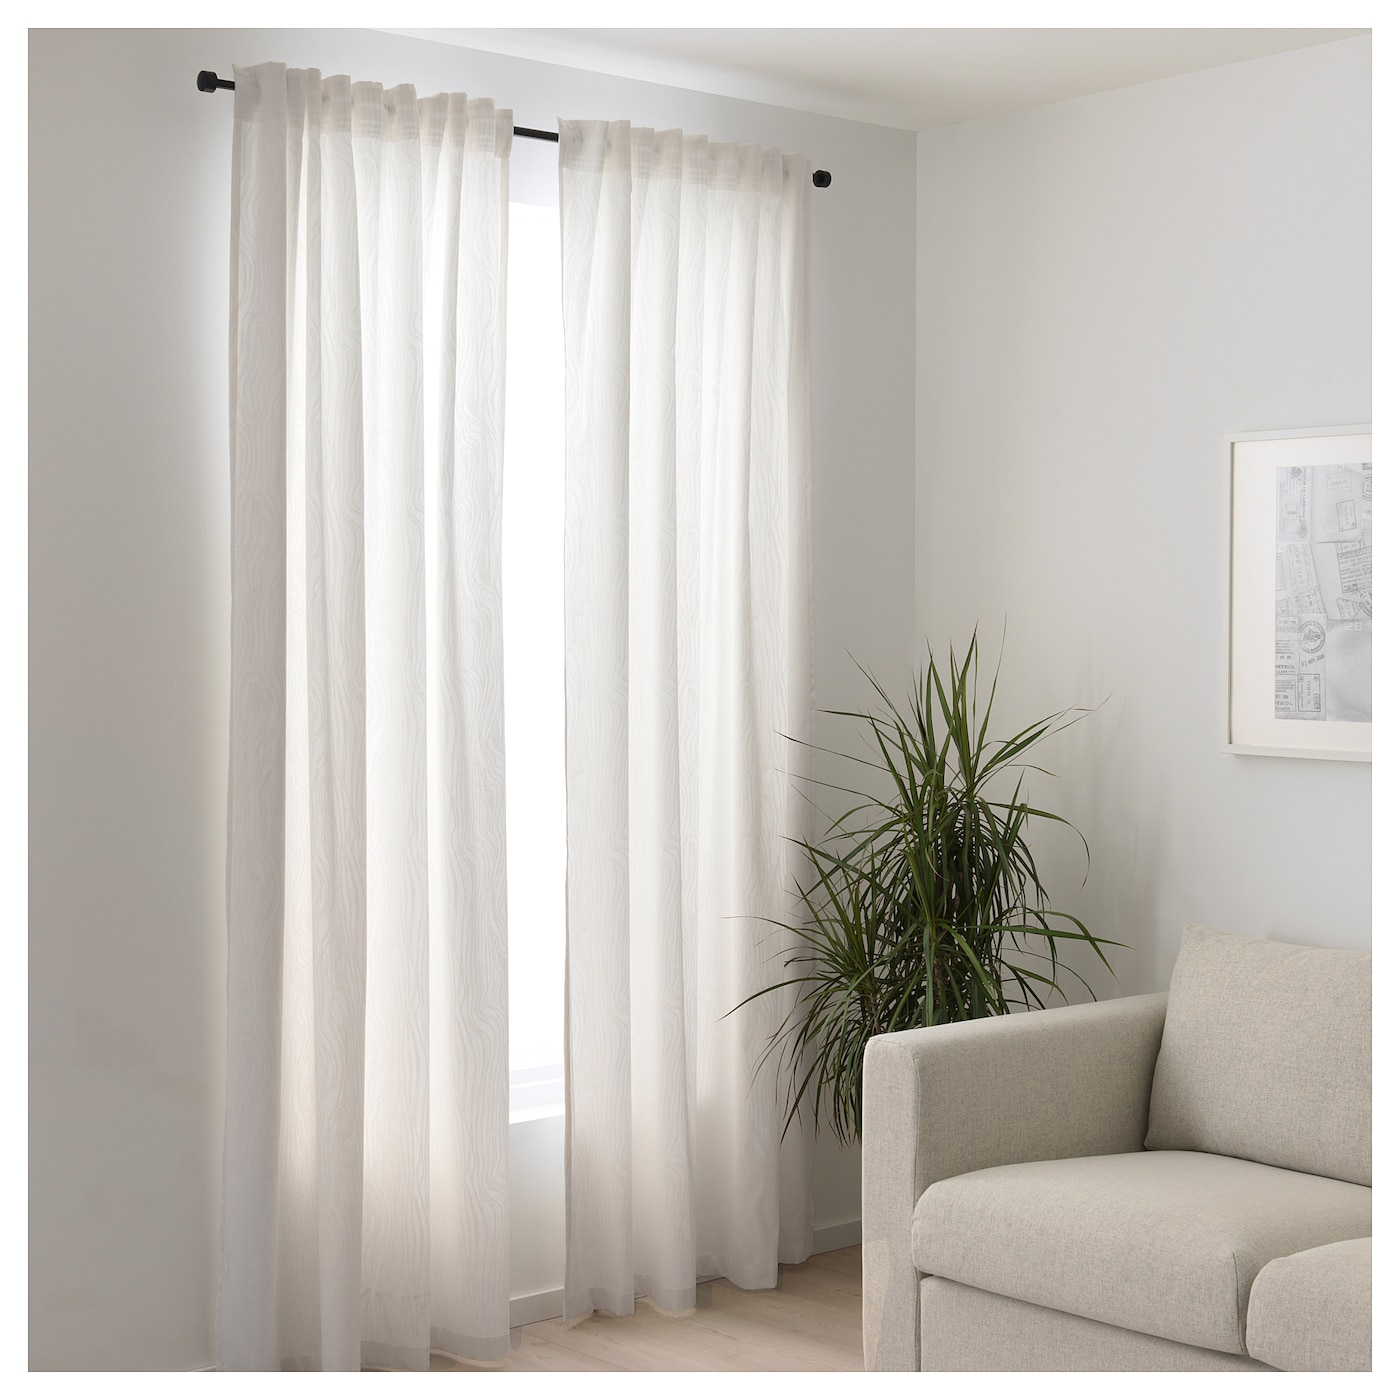 Ikea curtains white